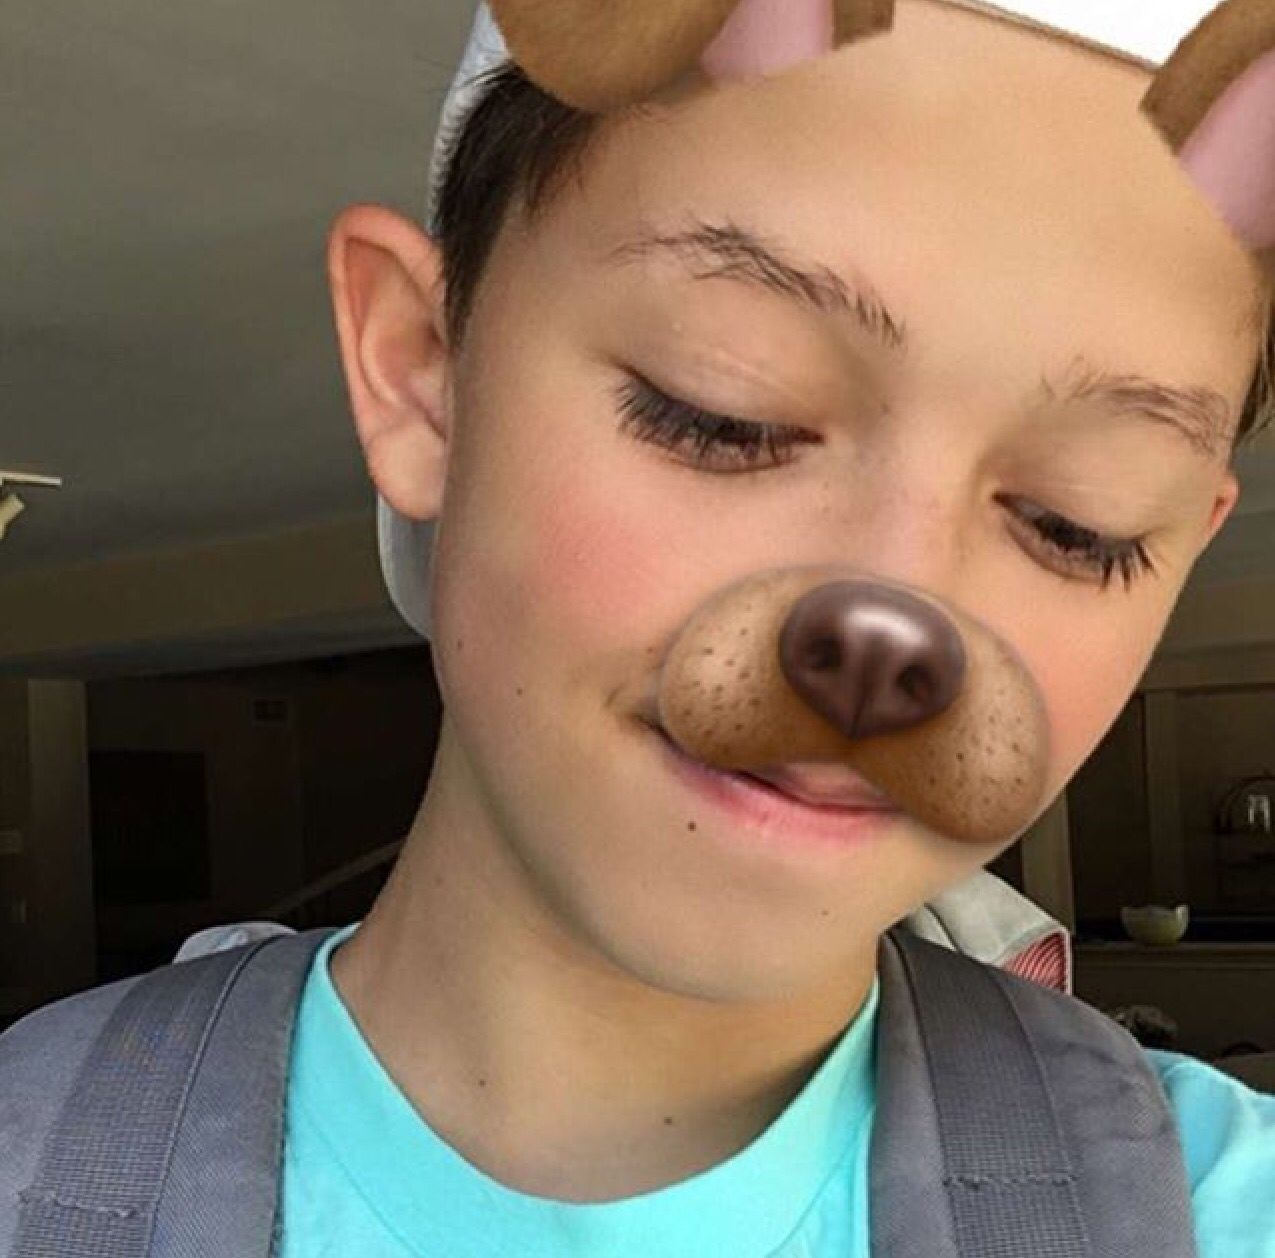 add me on snapchat jacobsartorius �� jacob sartorius